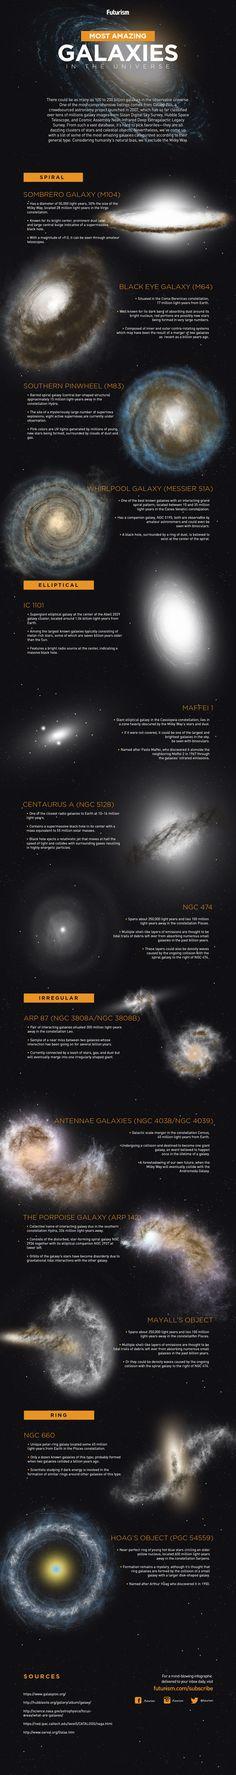 Amazing Galaxies